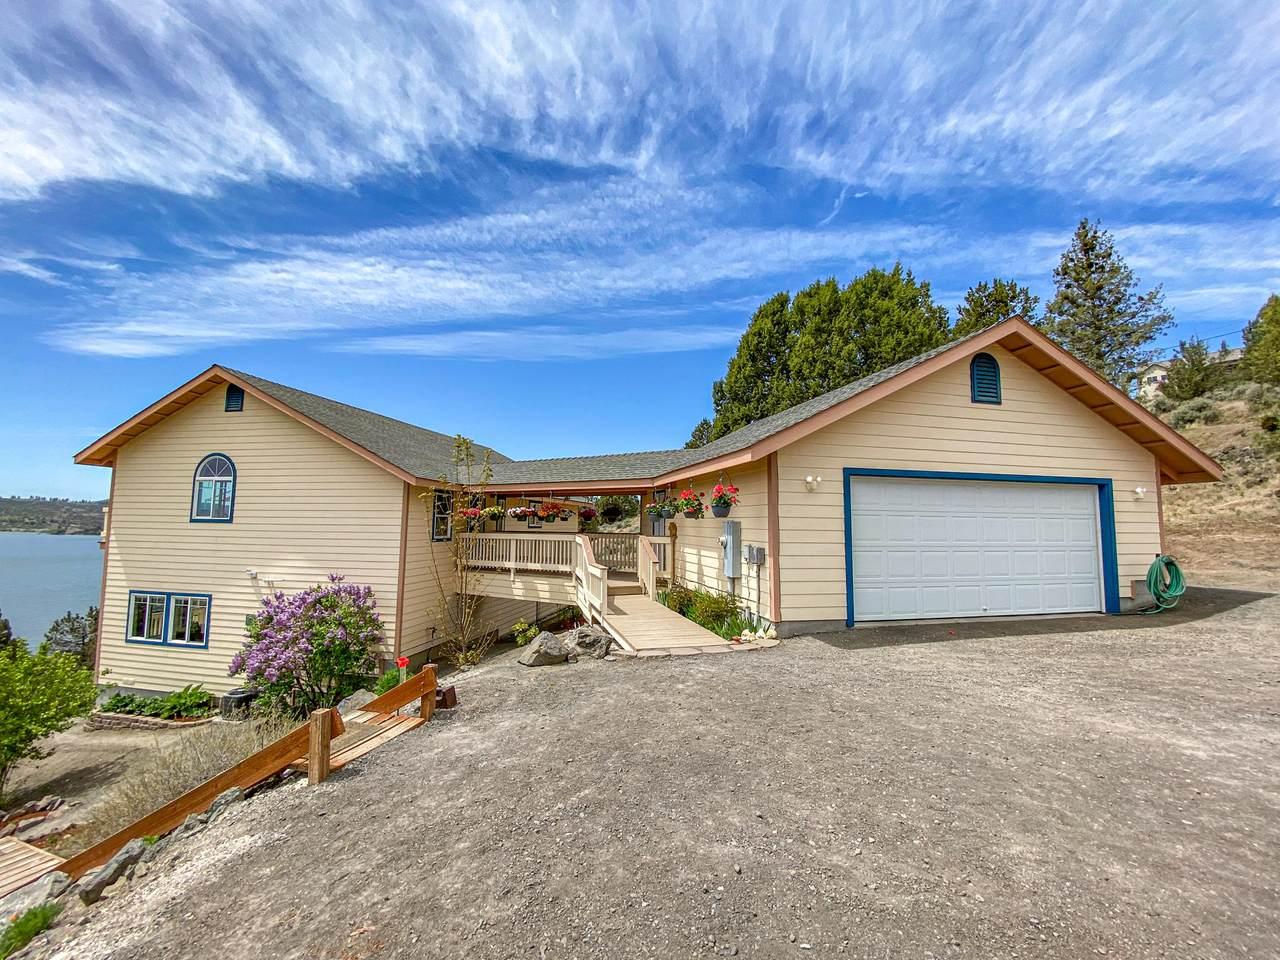 4840 Sunset Ridge Road - Photo 1